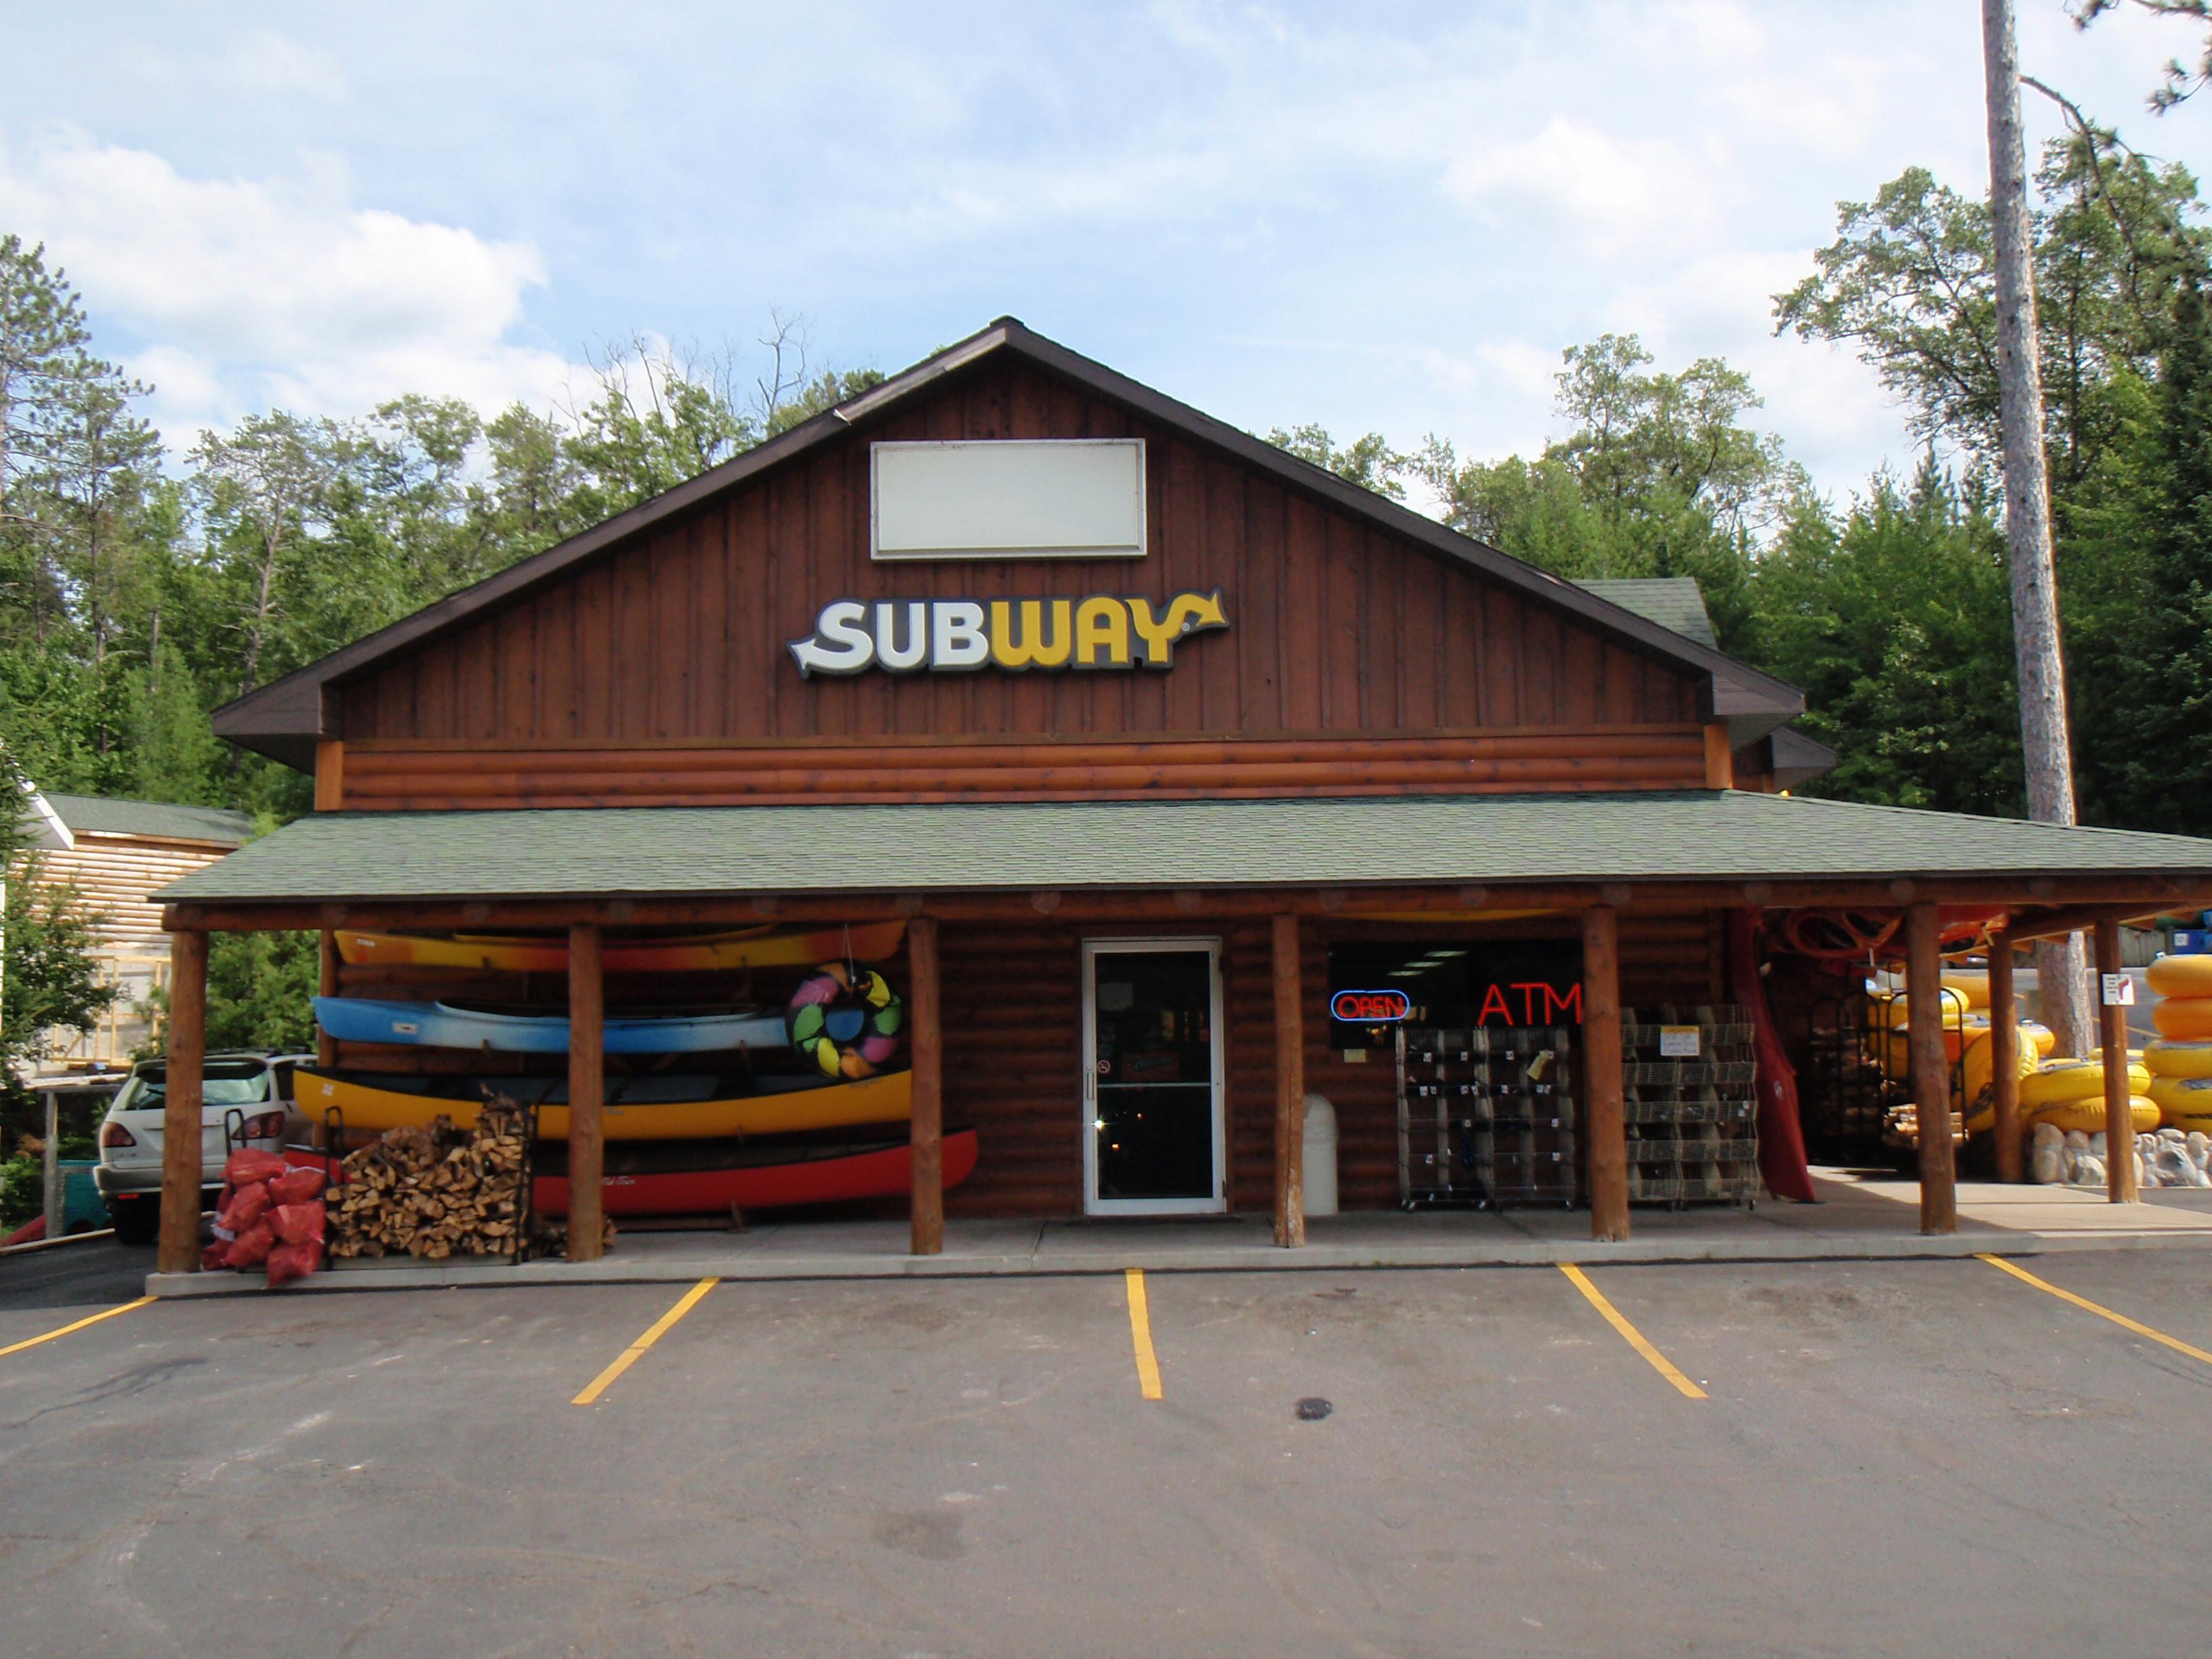 General Store & Subway - Northern Michigan Family Vacations